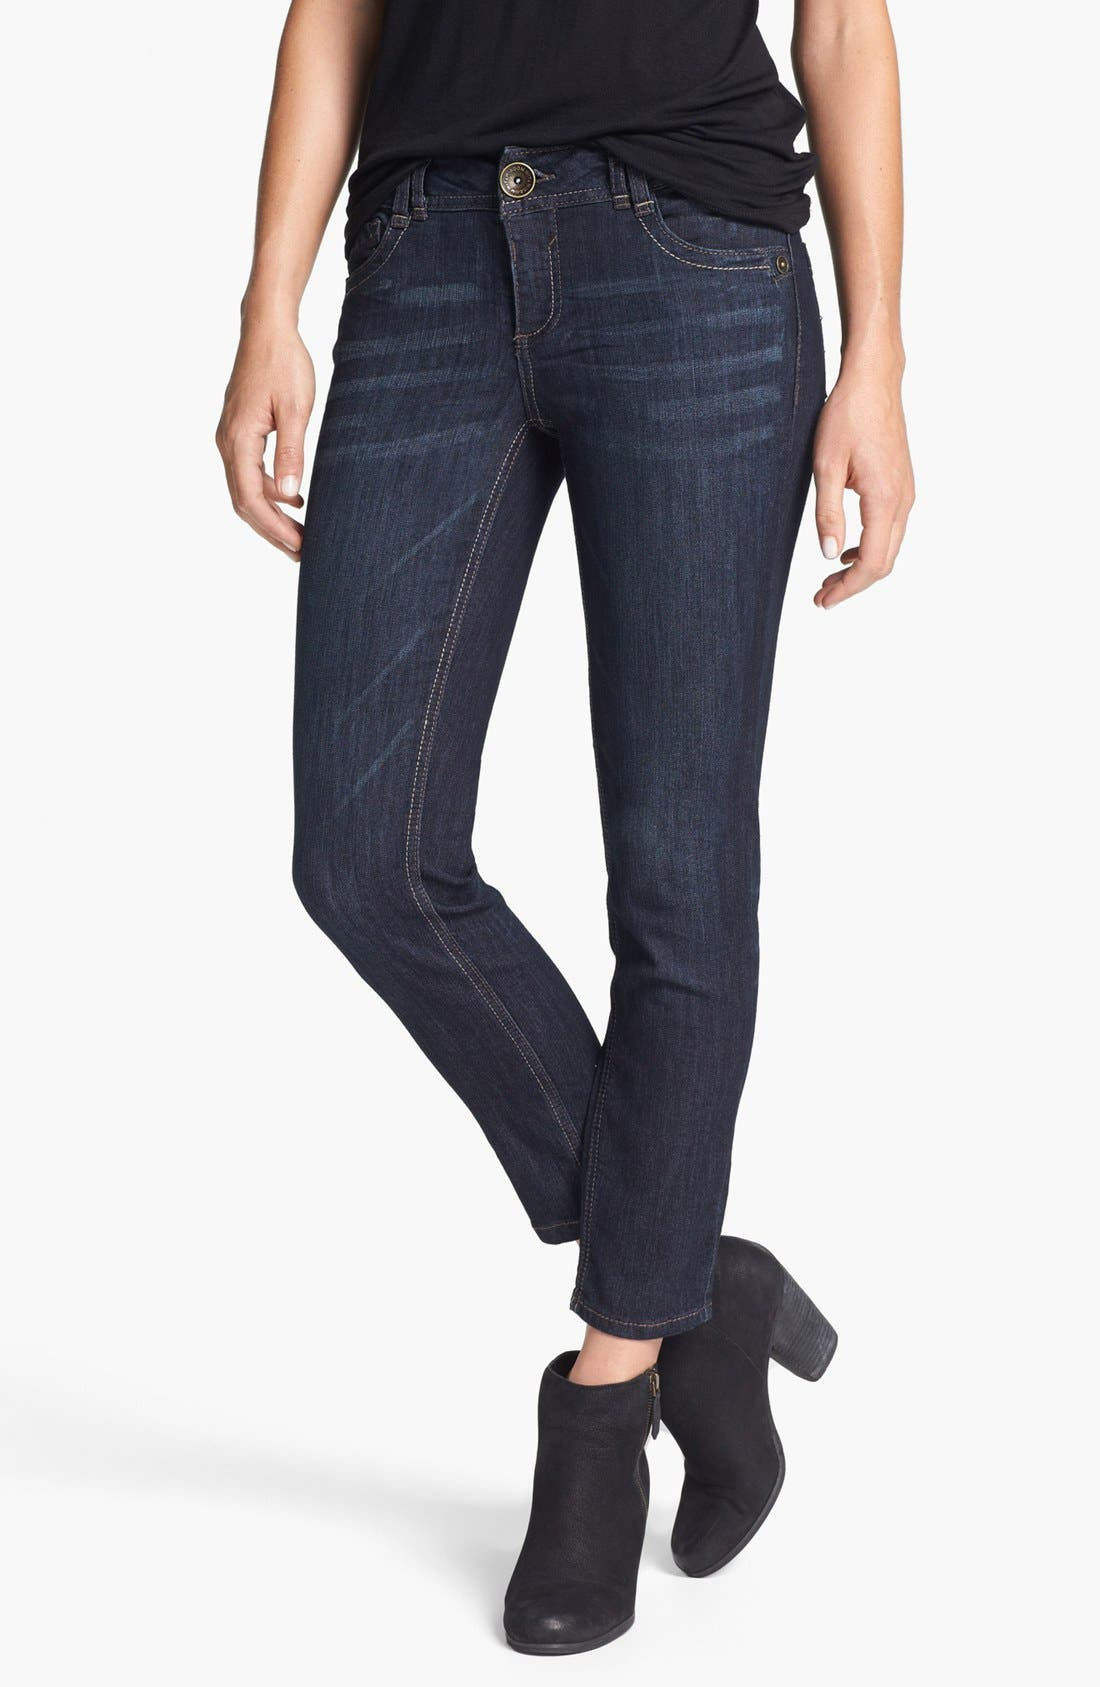 Alternate Image 1 Selected - Wit & Wisdom Skinny Ankle Jeans (Dark Blue)